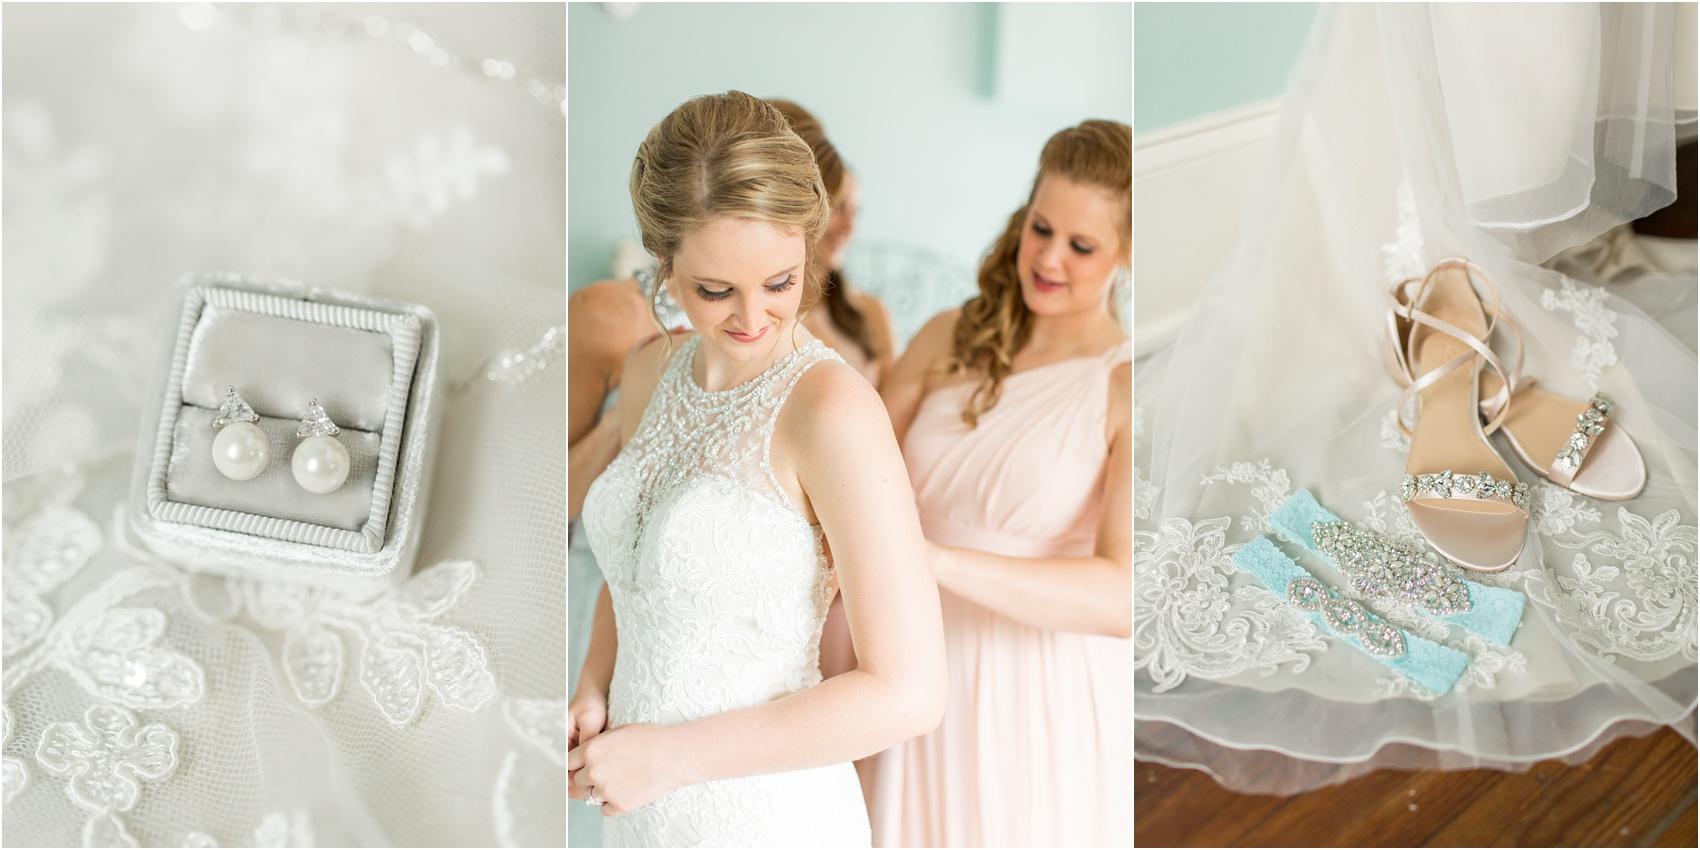 Savannah Eve Photography- Roper-Powell Wedding- Blog-5.jpg